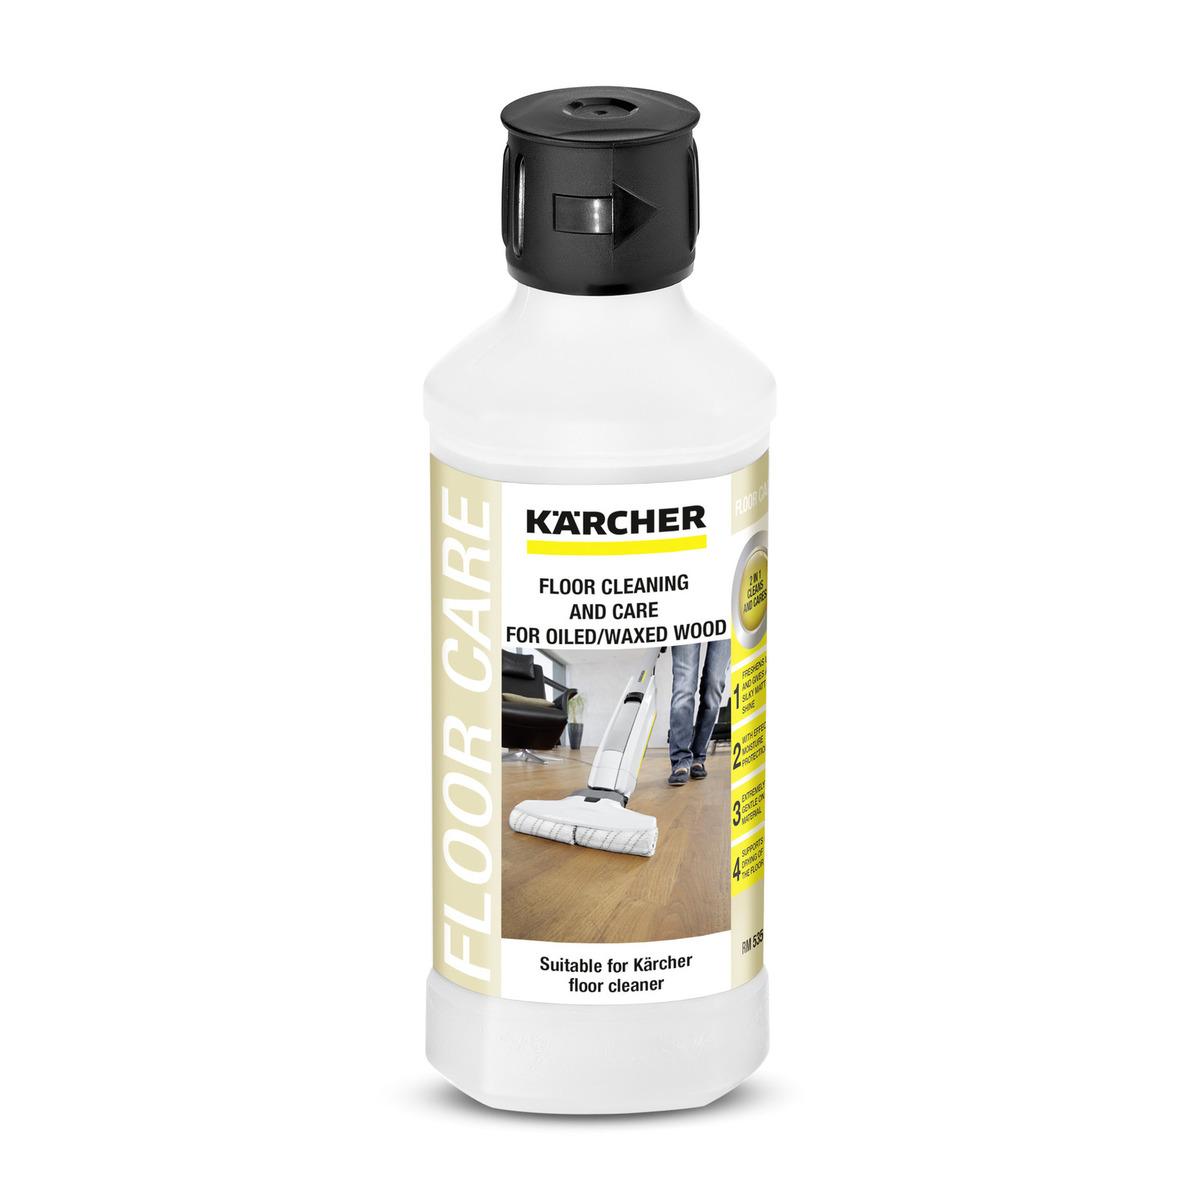 karcher-sredstvo-za-čišćenje-podova